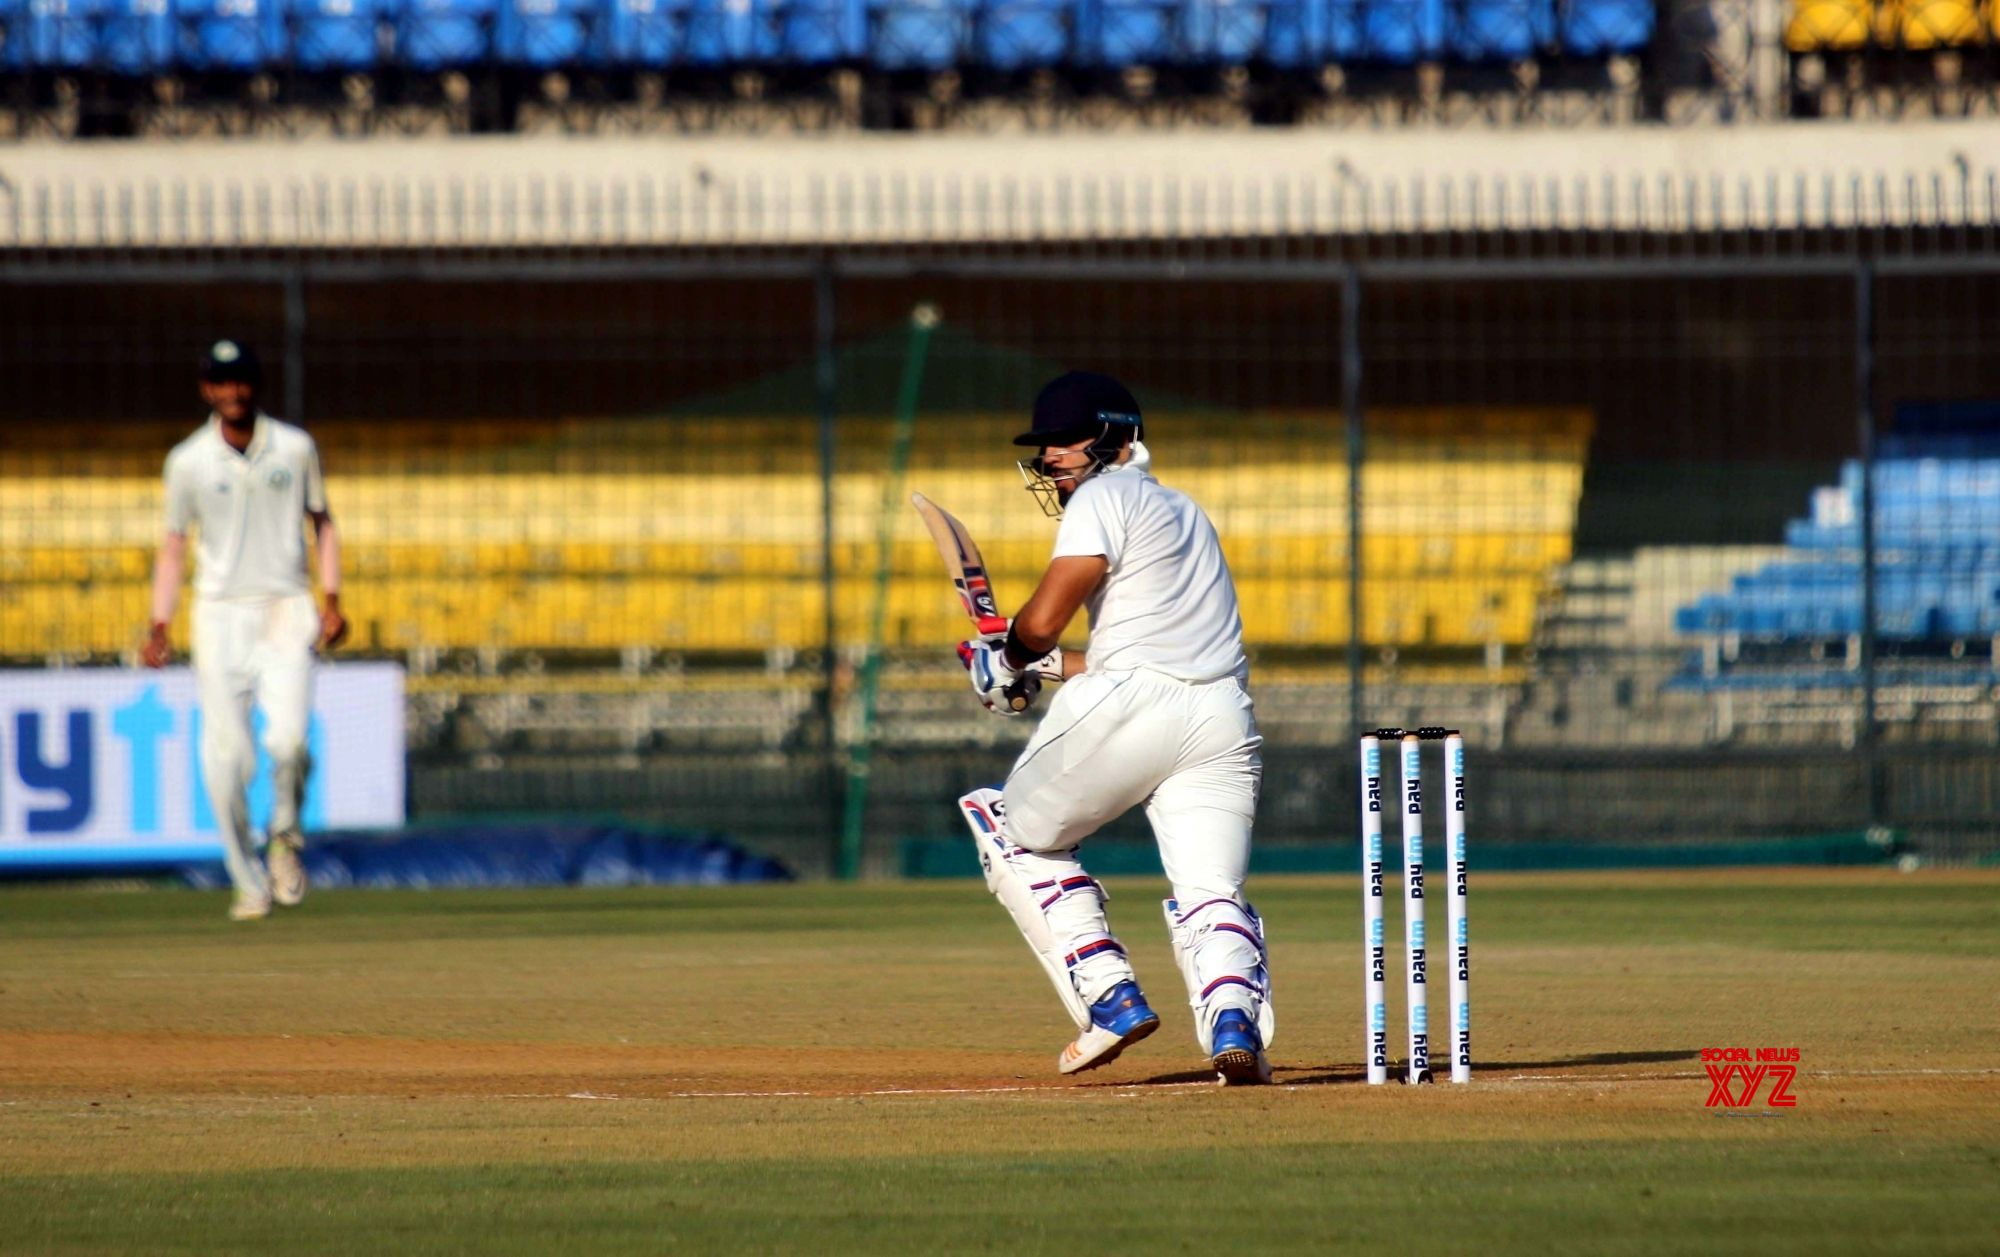 Ranji Trophy: Dhruv Shorey named Delhi captain, Nitish Rana deputy